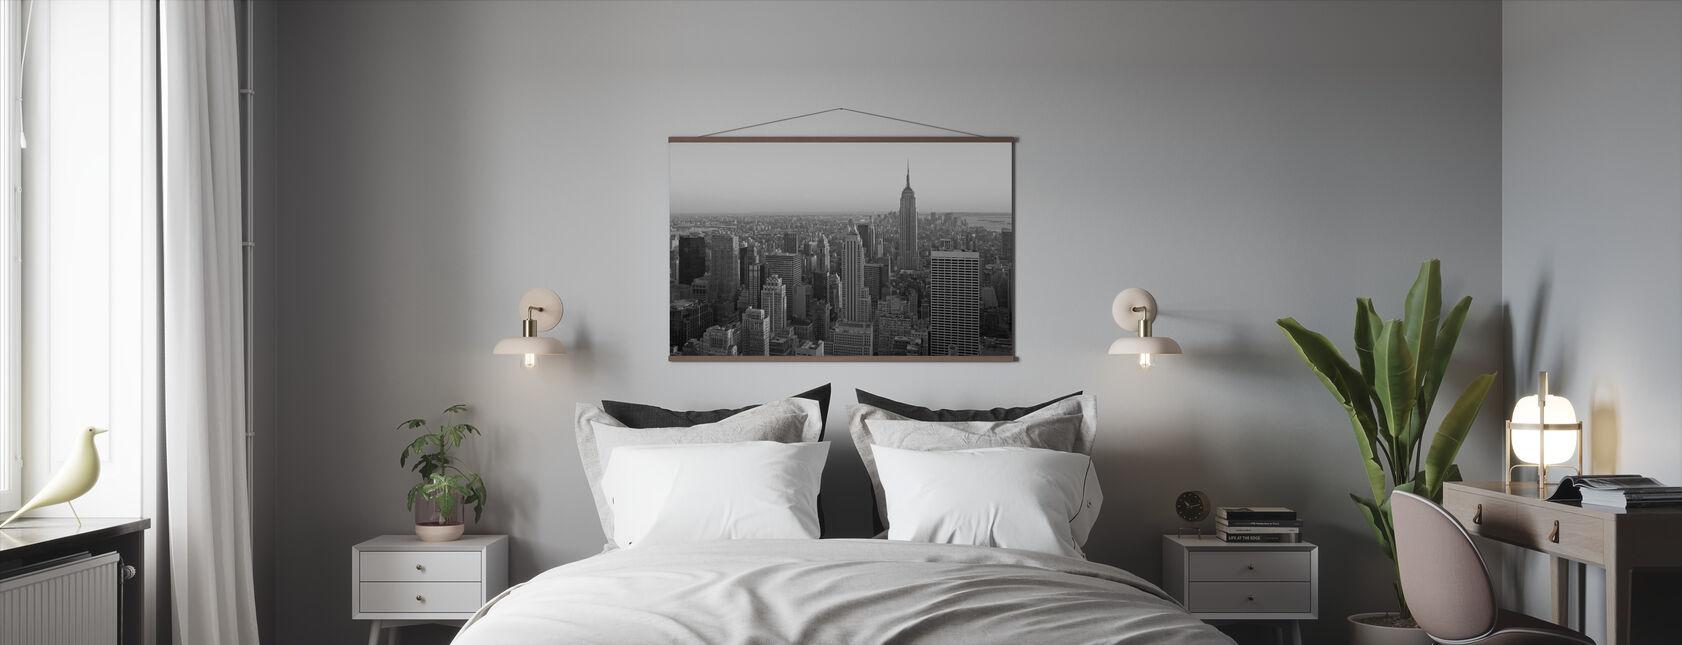 New York City, New York - Poster - Bedroom